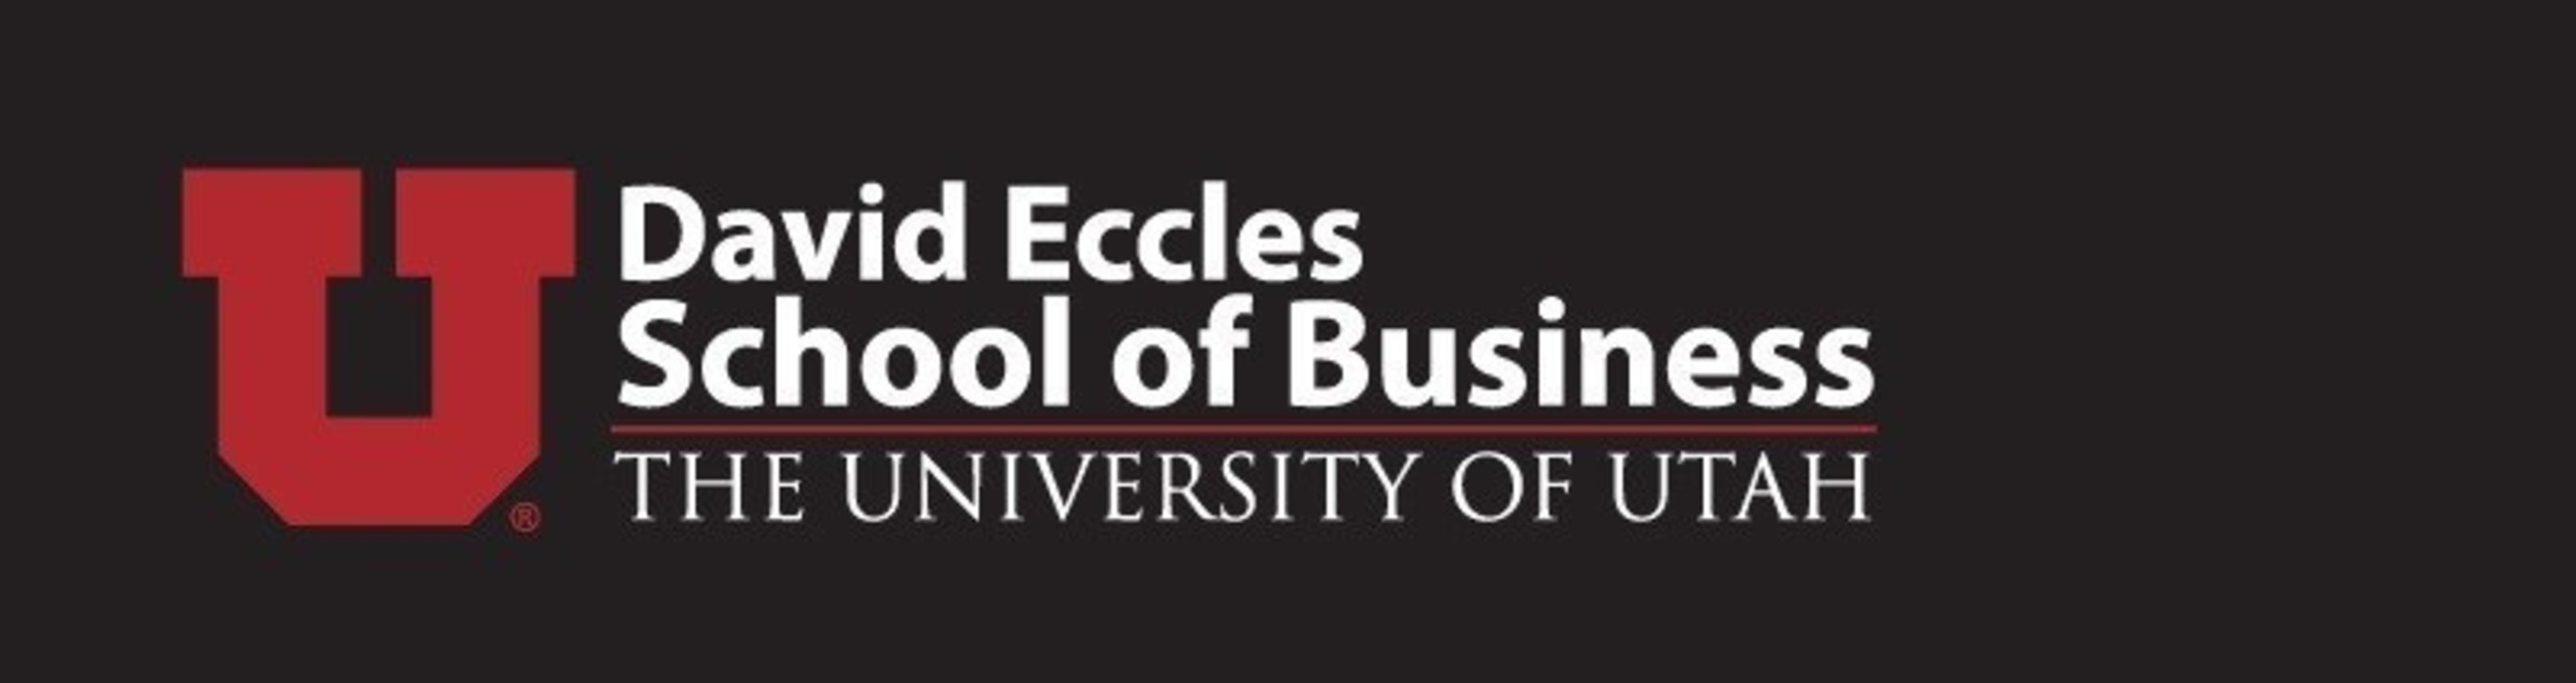 David Eccles School of Business (PRNewsFoto/David Eccles School of Business)